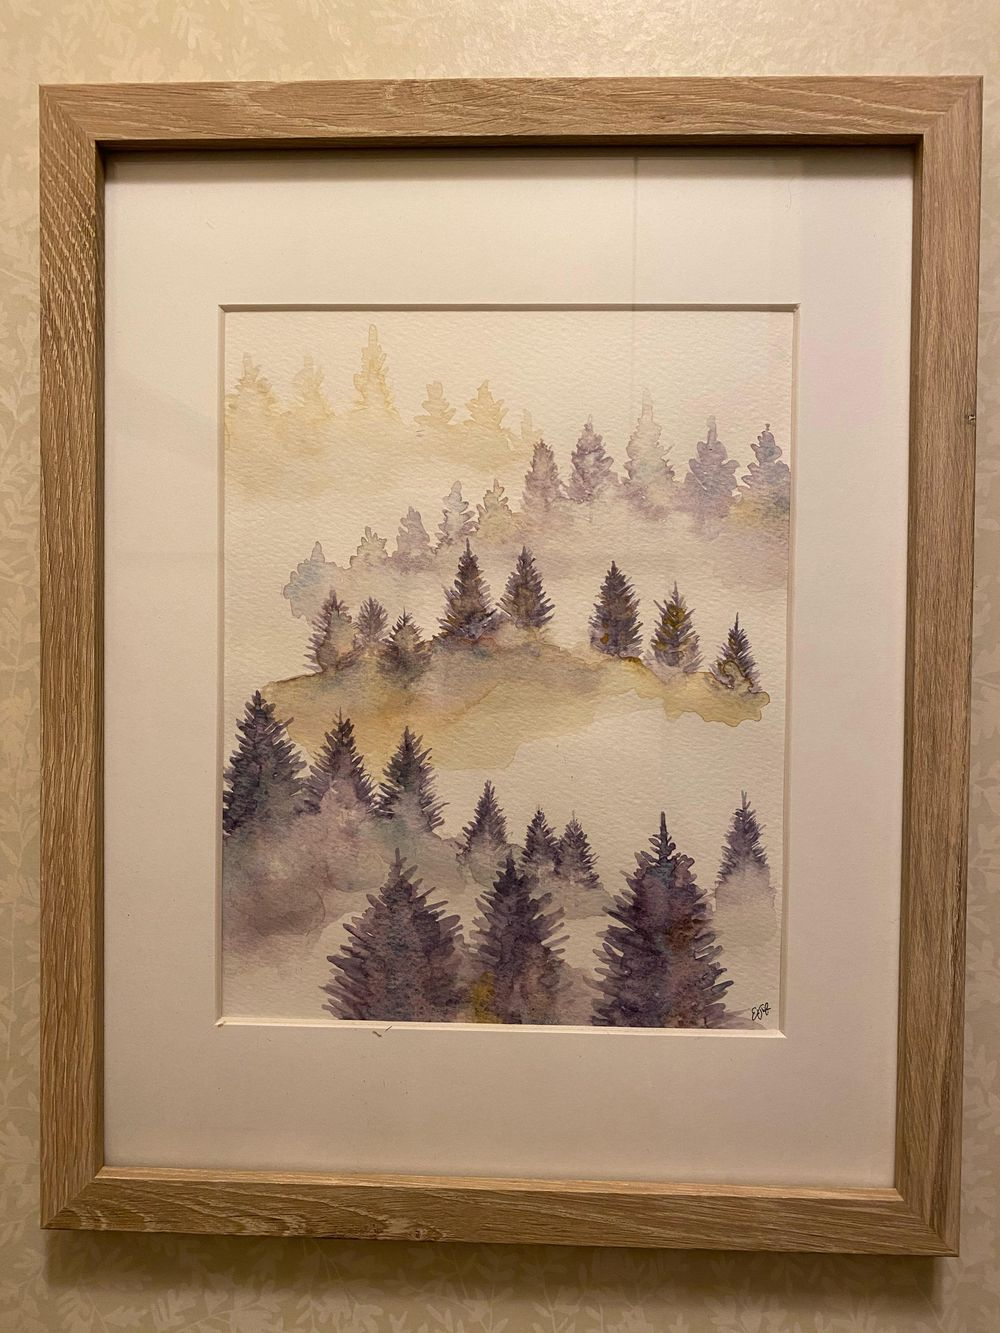 Misty Tree Landscape - image 3 - student project